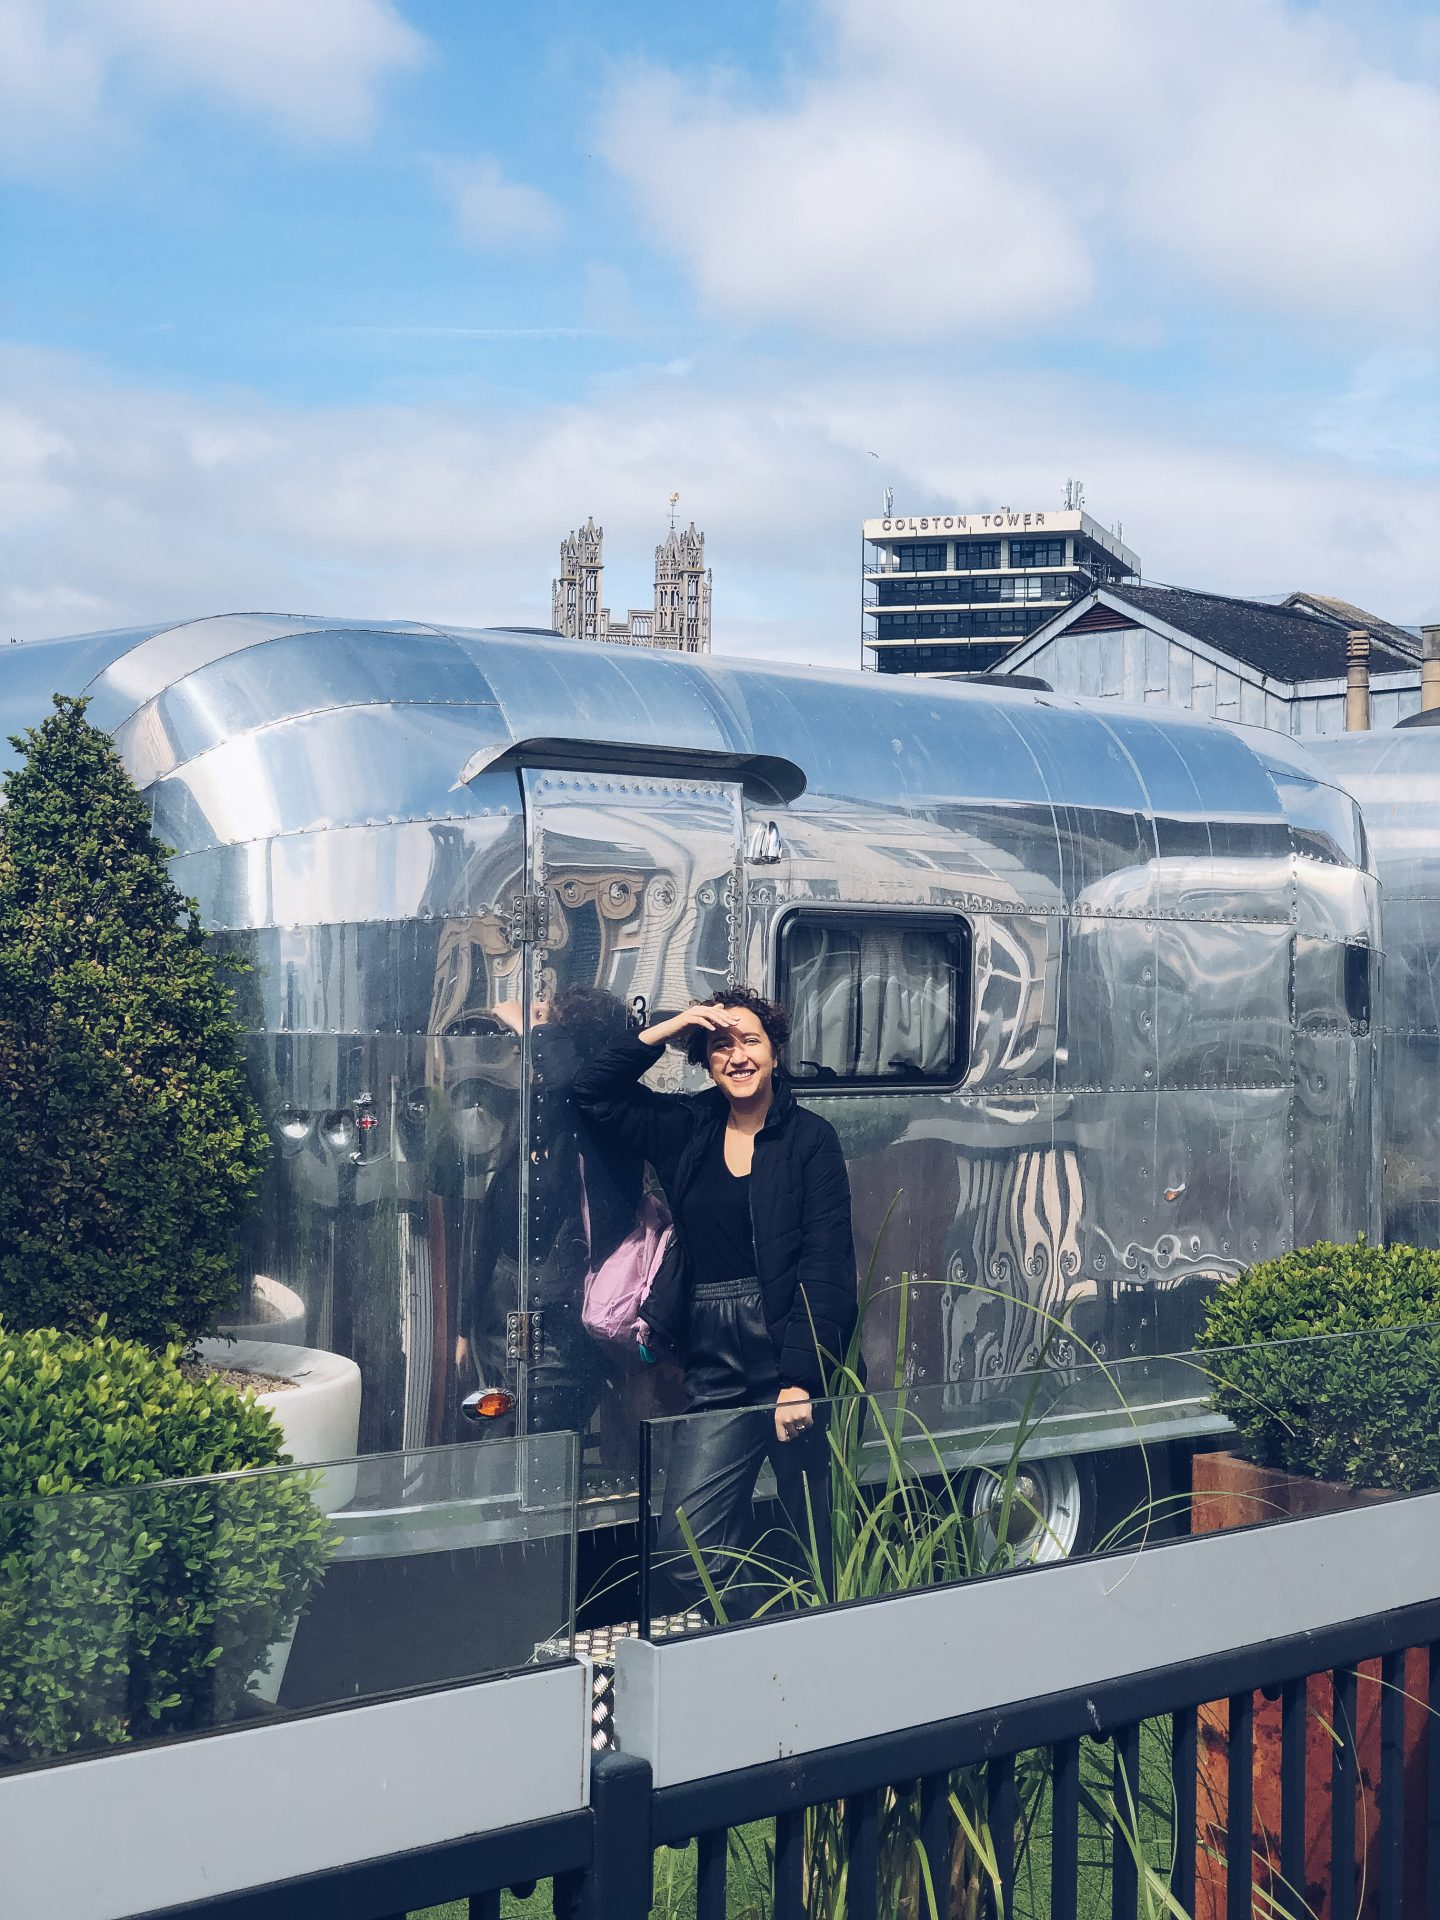 brooks guesthouse bristol caravan